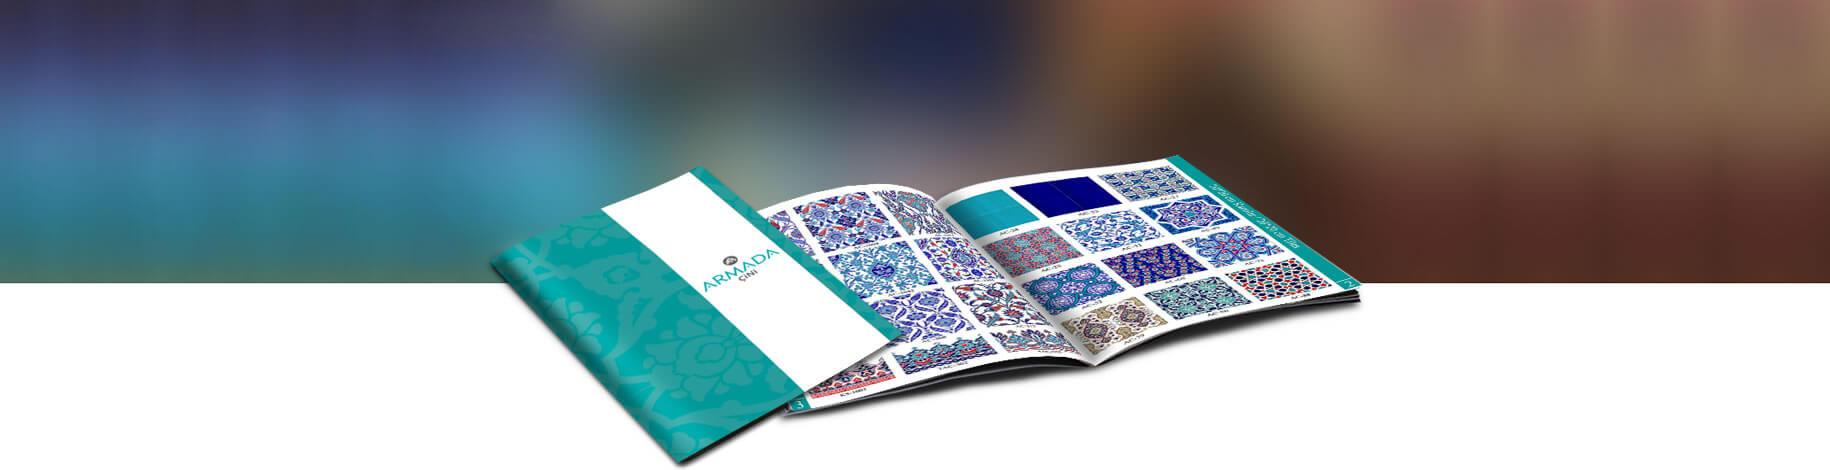 anasayfa-katalog